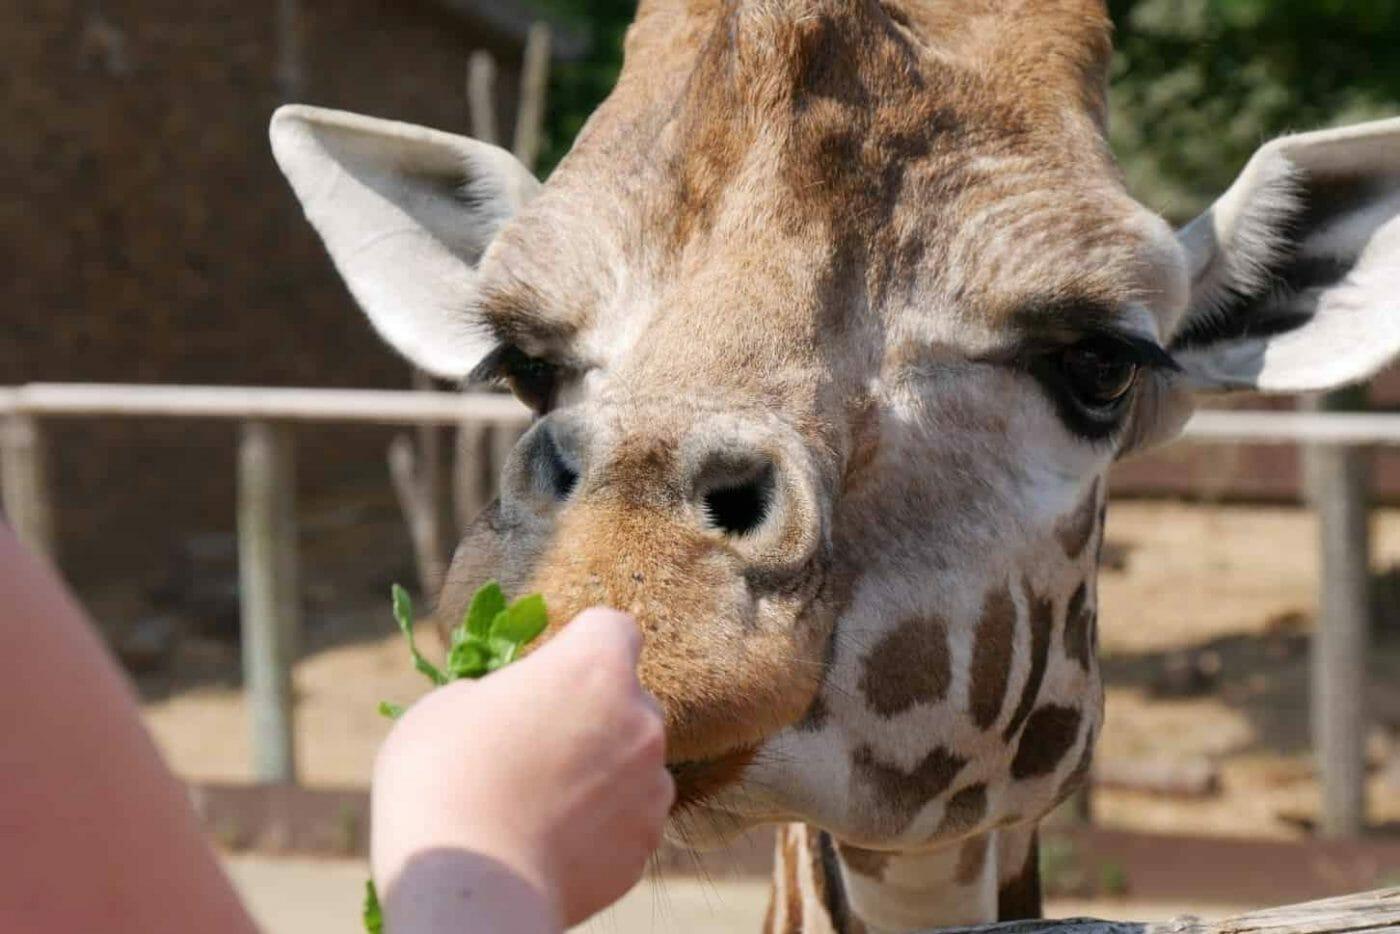 Girl feeding Giraffe mint at London Zoo